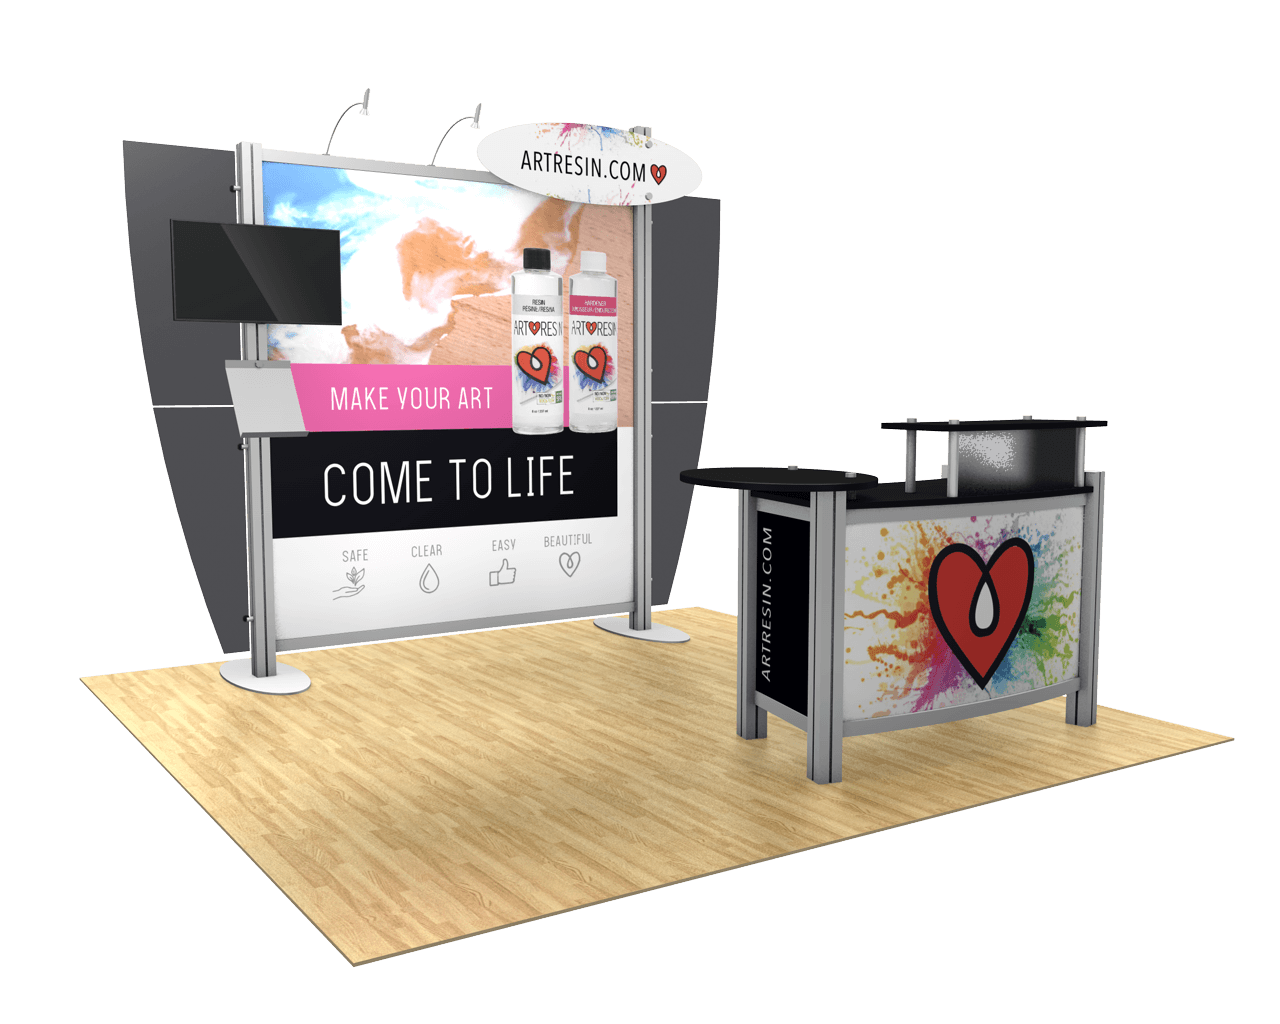 XVline Modular 10ft Trade Show Display Kit - 10.01